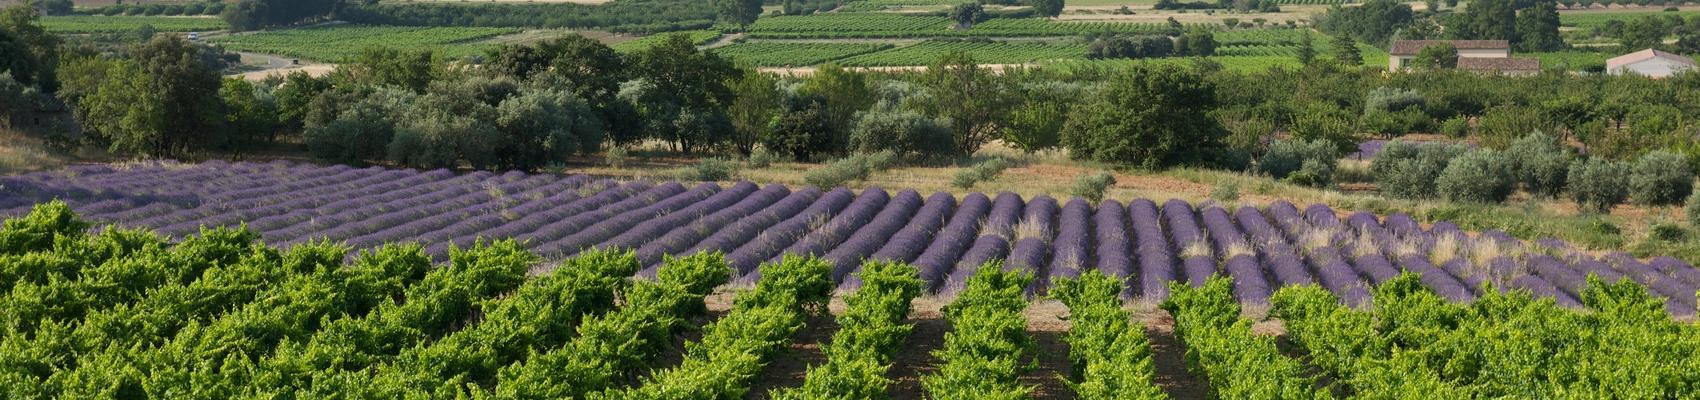 Rhône Valley Vineyards